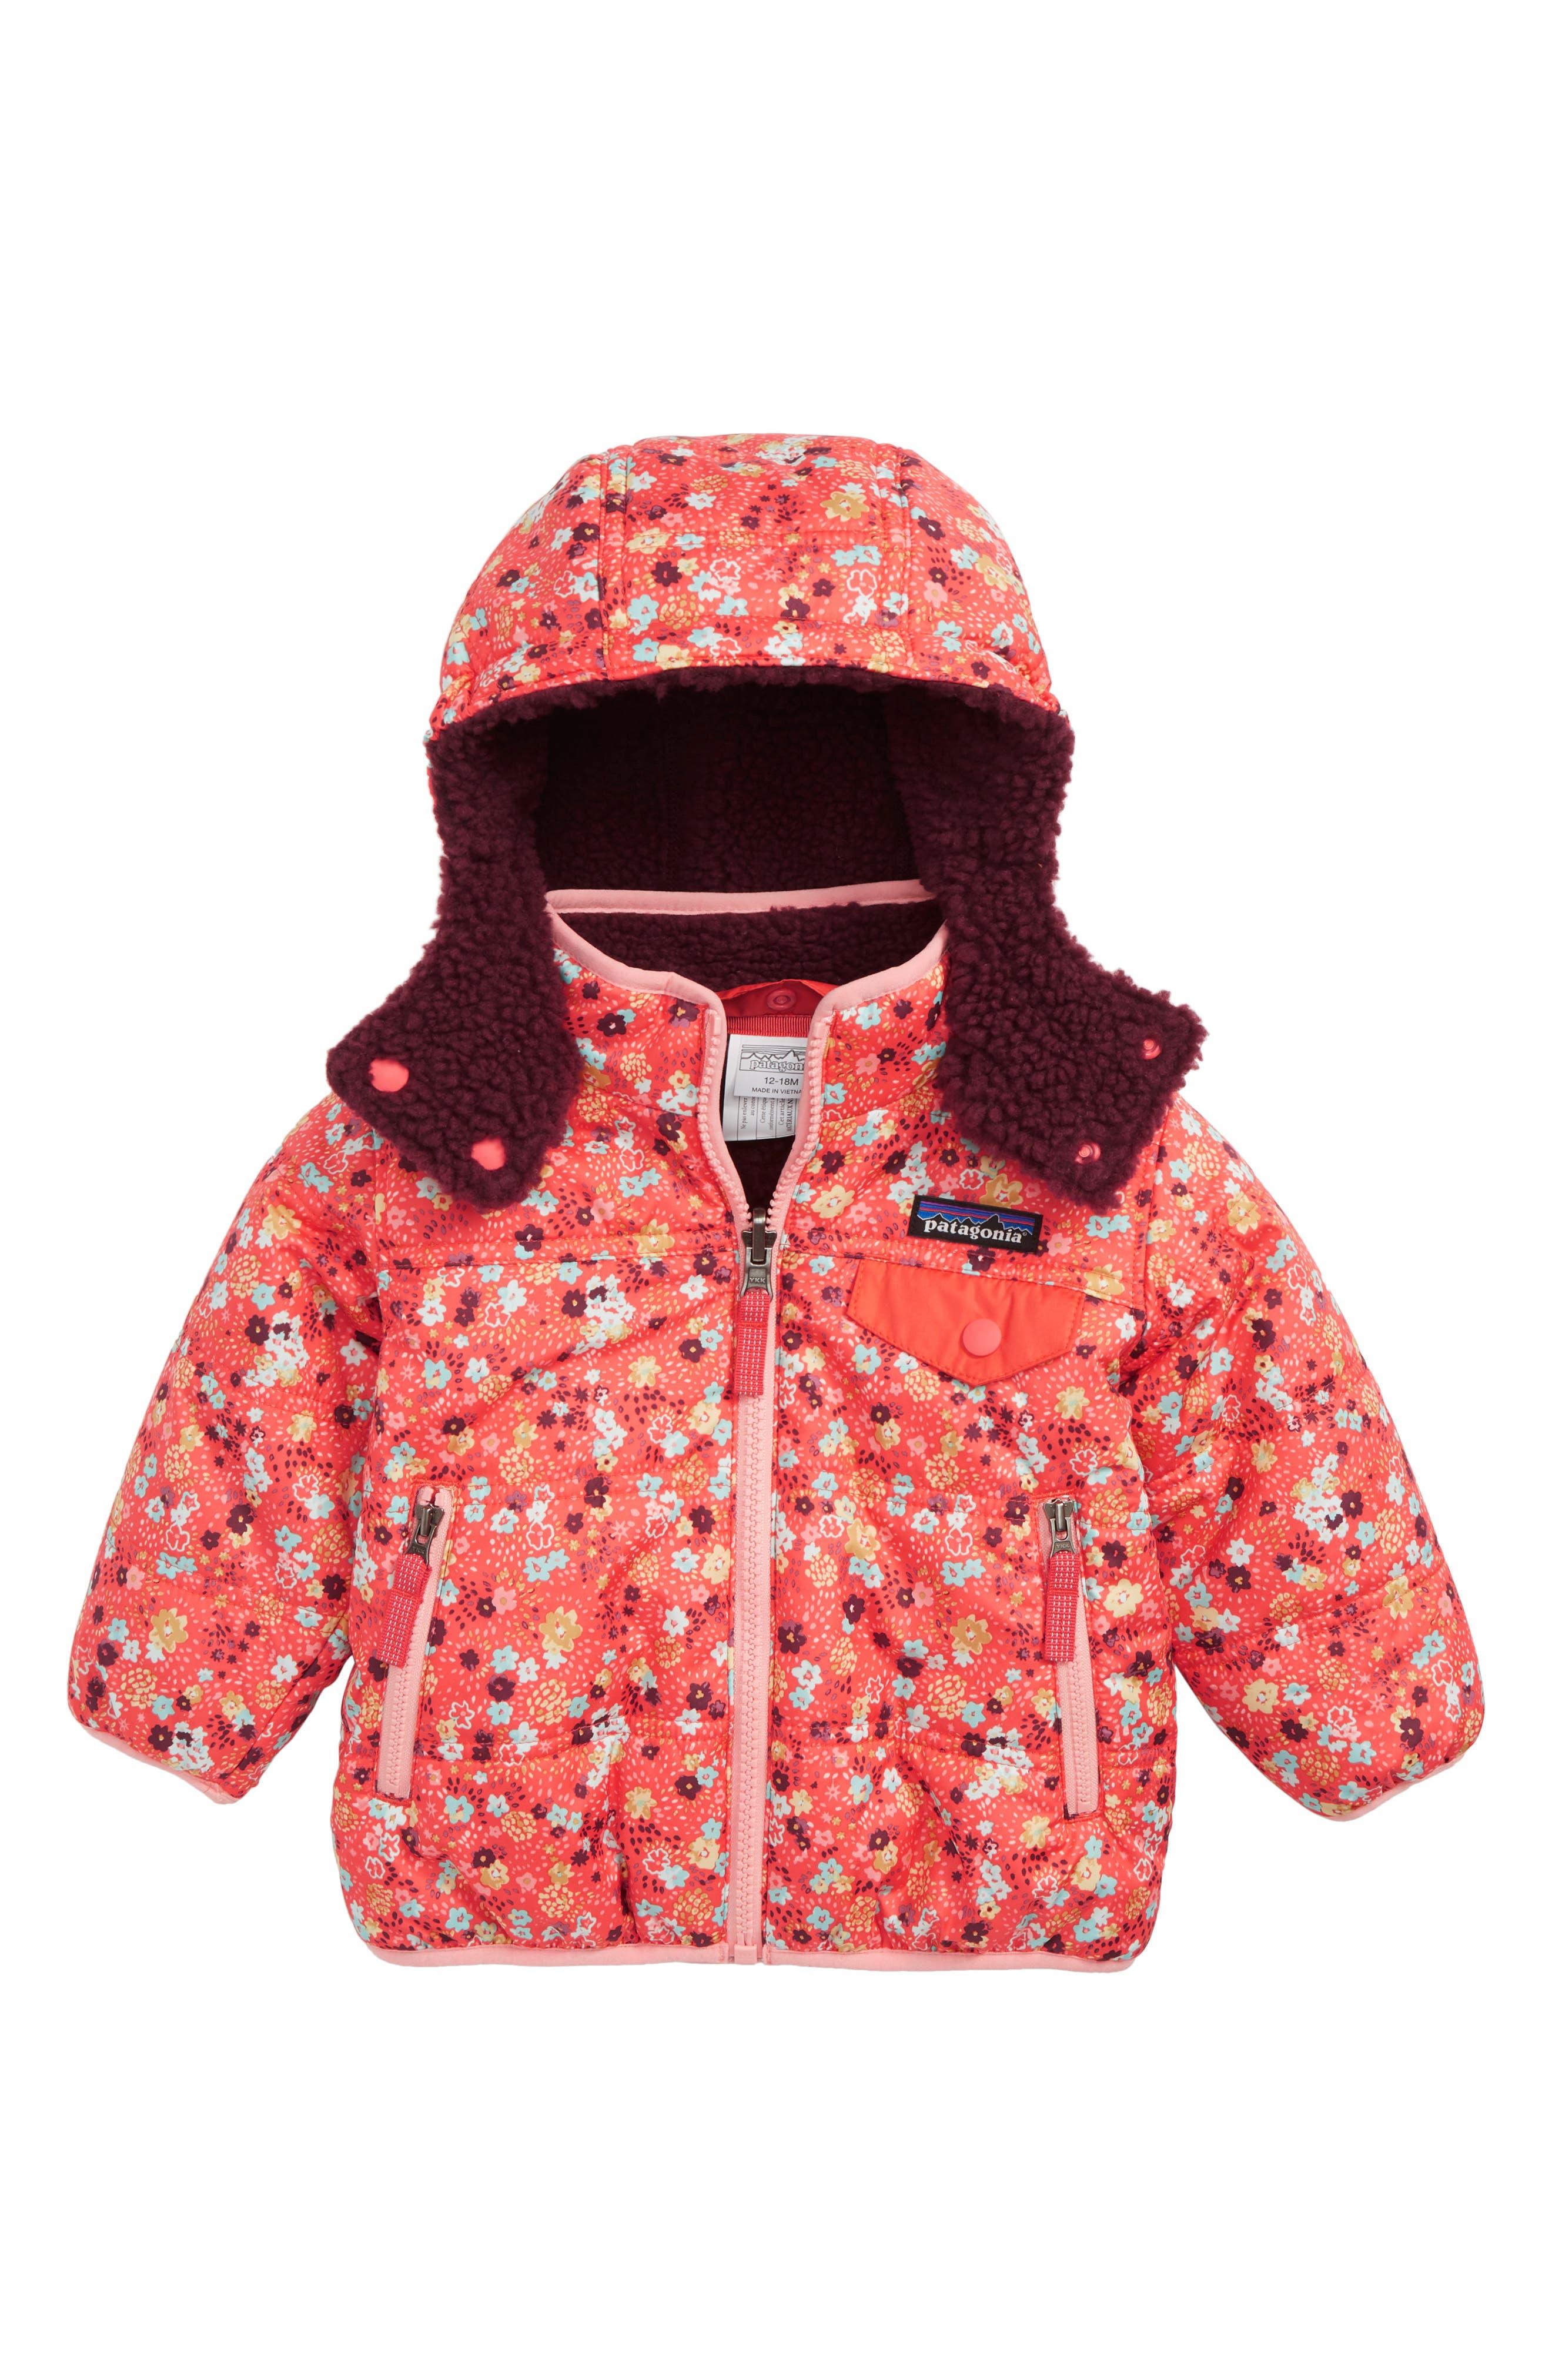 Tribbles Reversible Water Resistant Snow Jacket,                         Main,                         color, UDSC UNTAMED DITSY SPICE CORAL